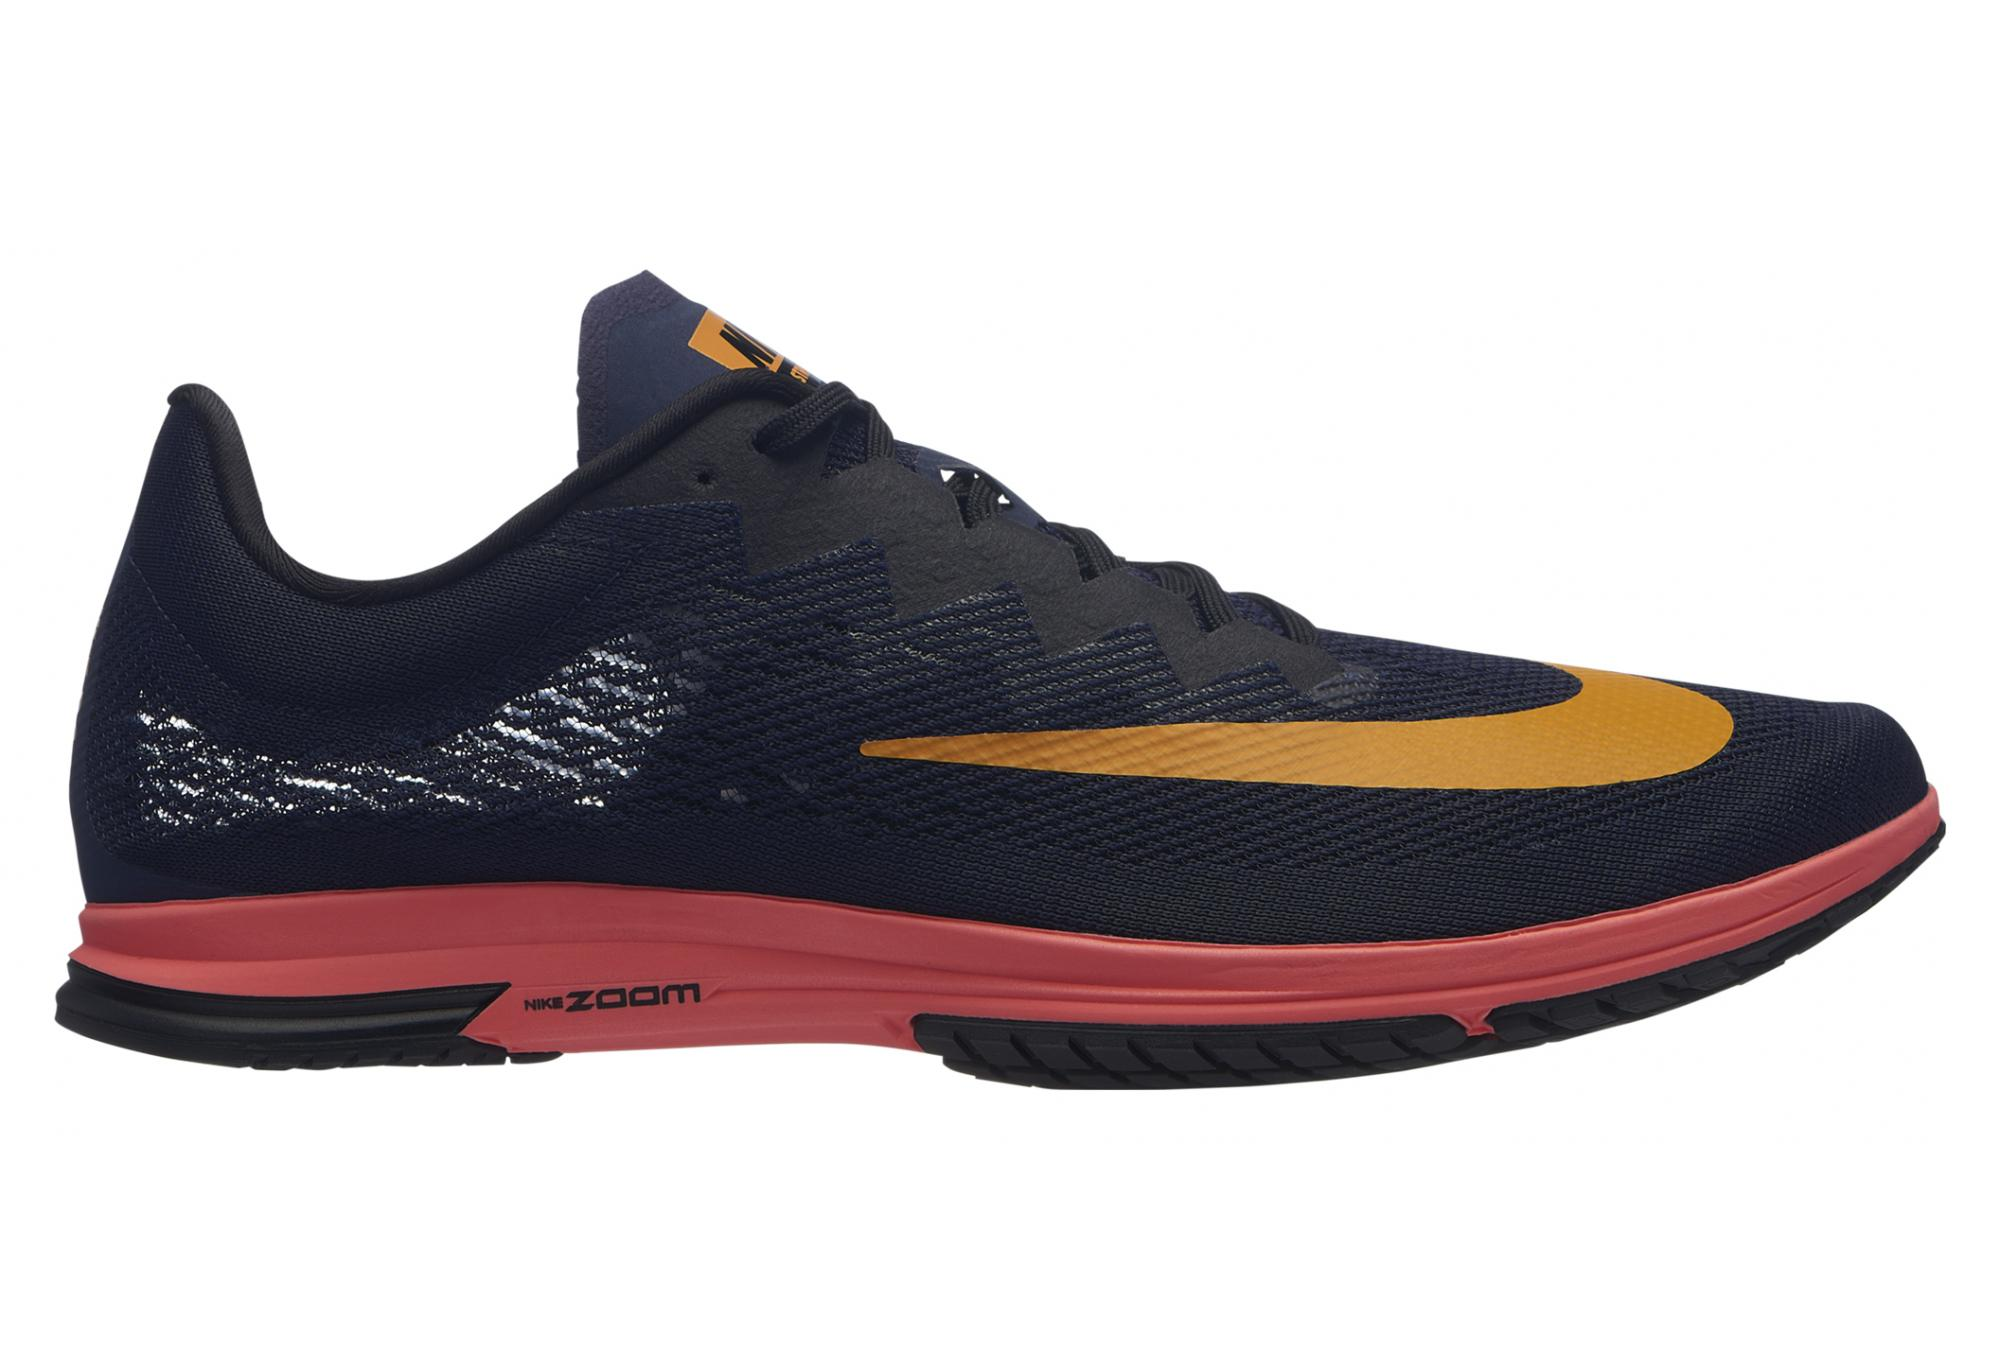 Nike Zoom Streak LT 4 Bleu Orange Rose Unisex